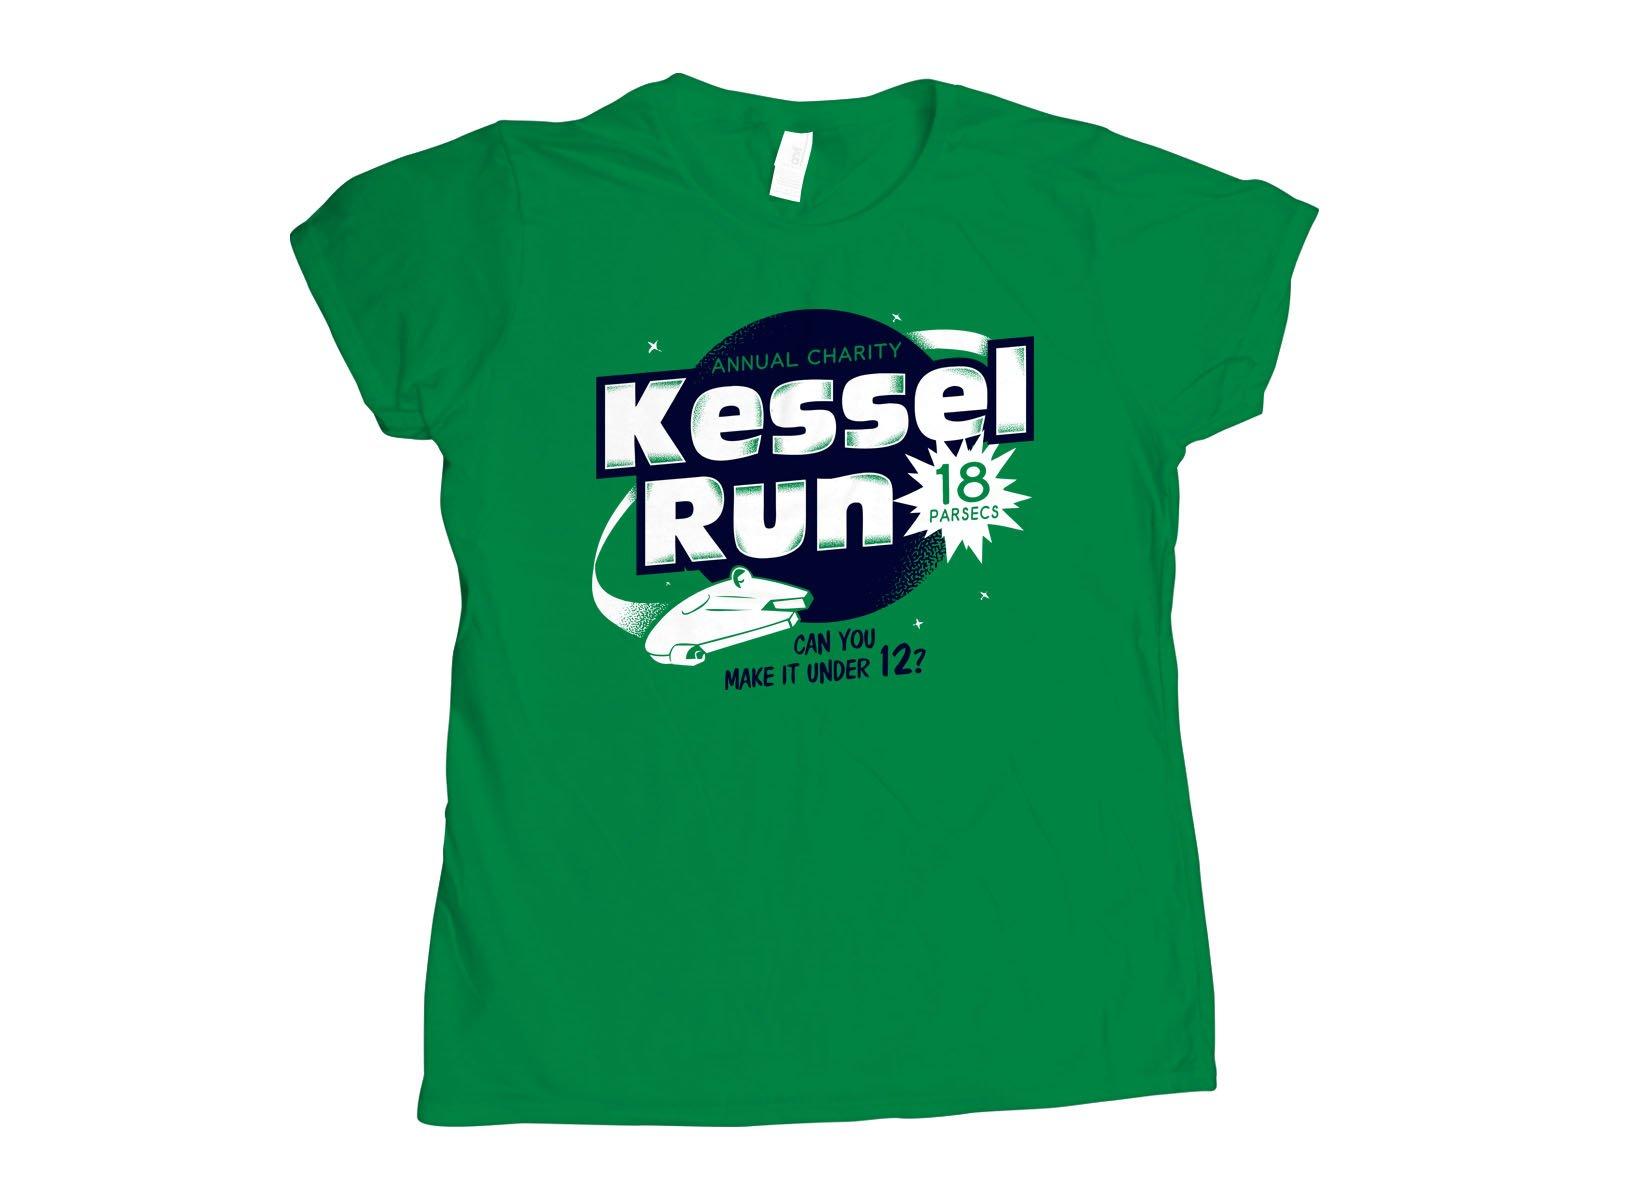 Kessel Run on Womens T-Shirt